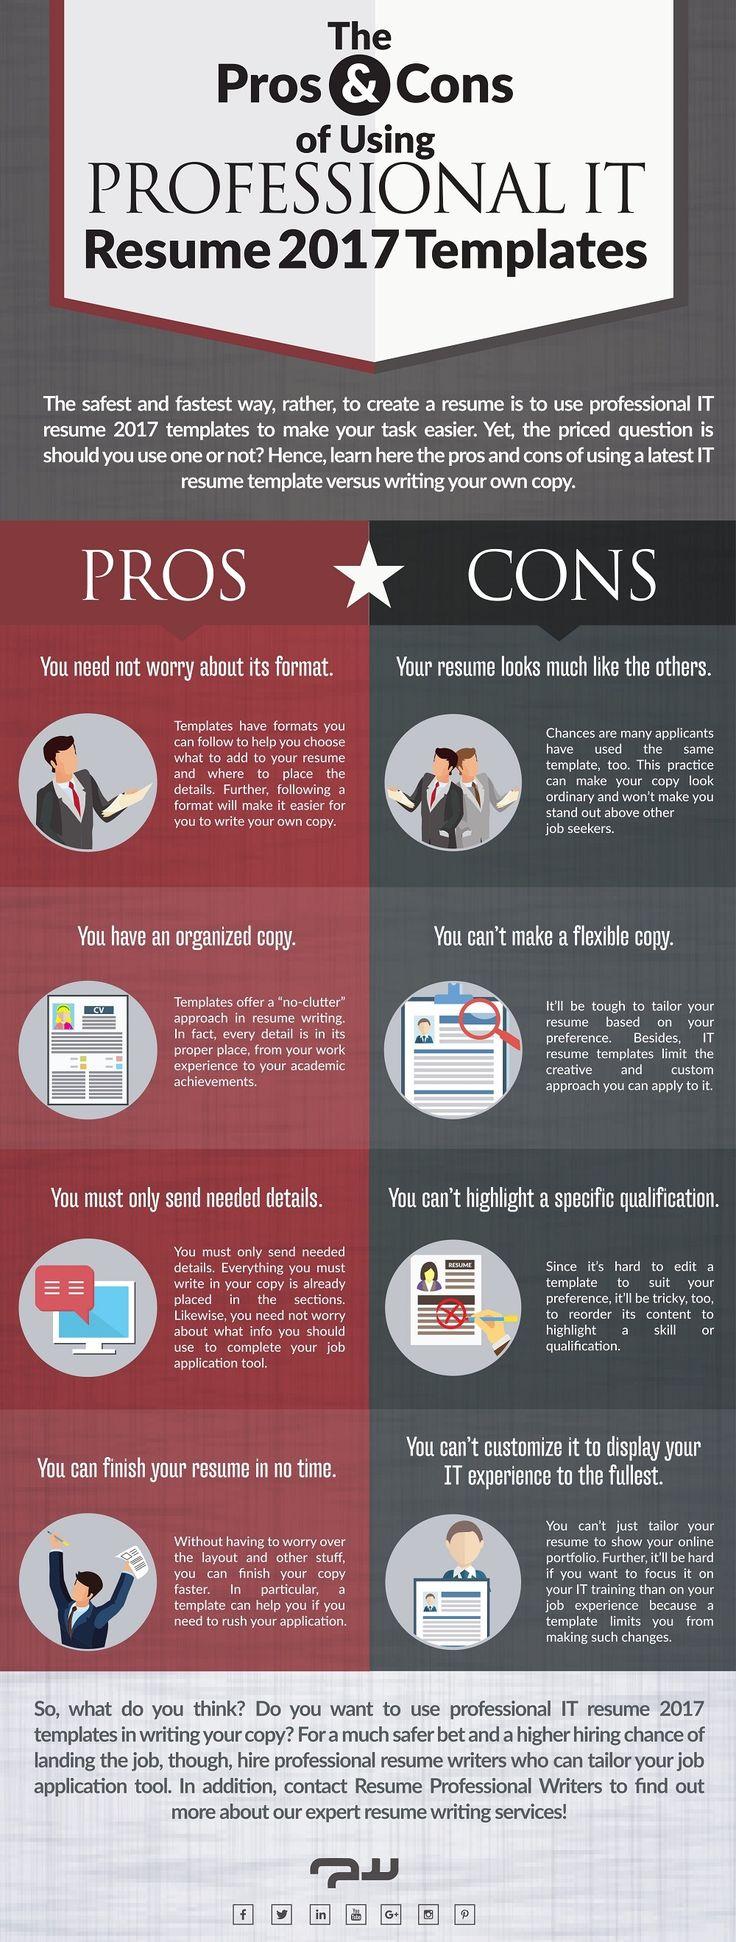 14 best Resume Tips and Tricks images on Pinterest   Resume tips ...